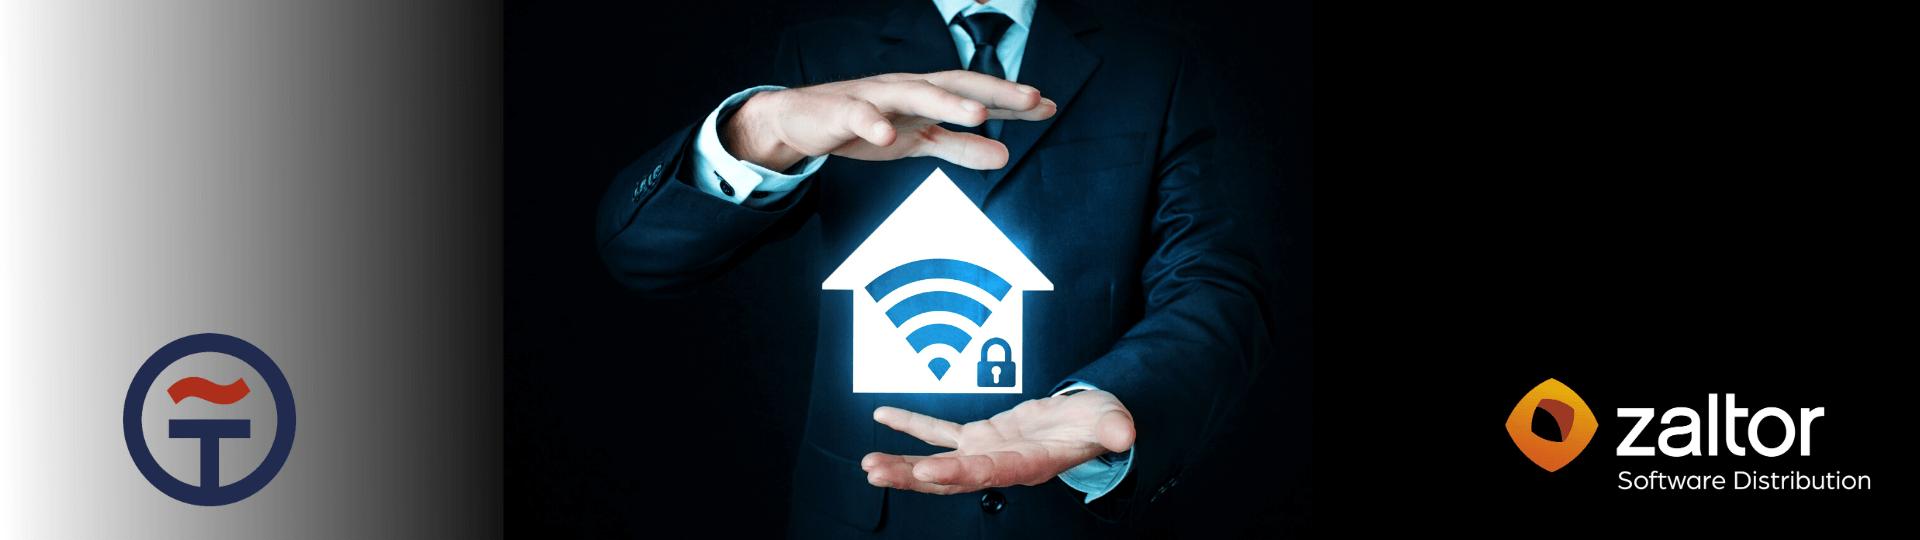 distribuidor espana tecteco wifi segura